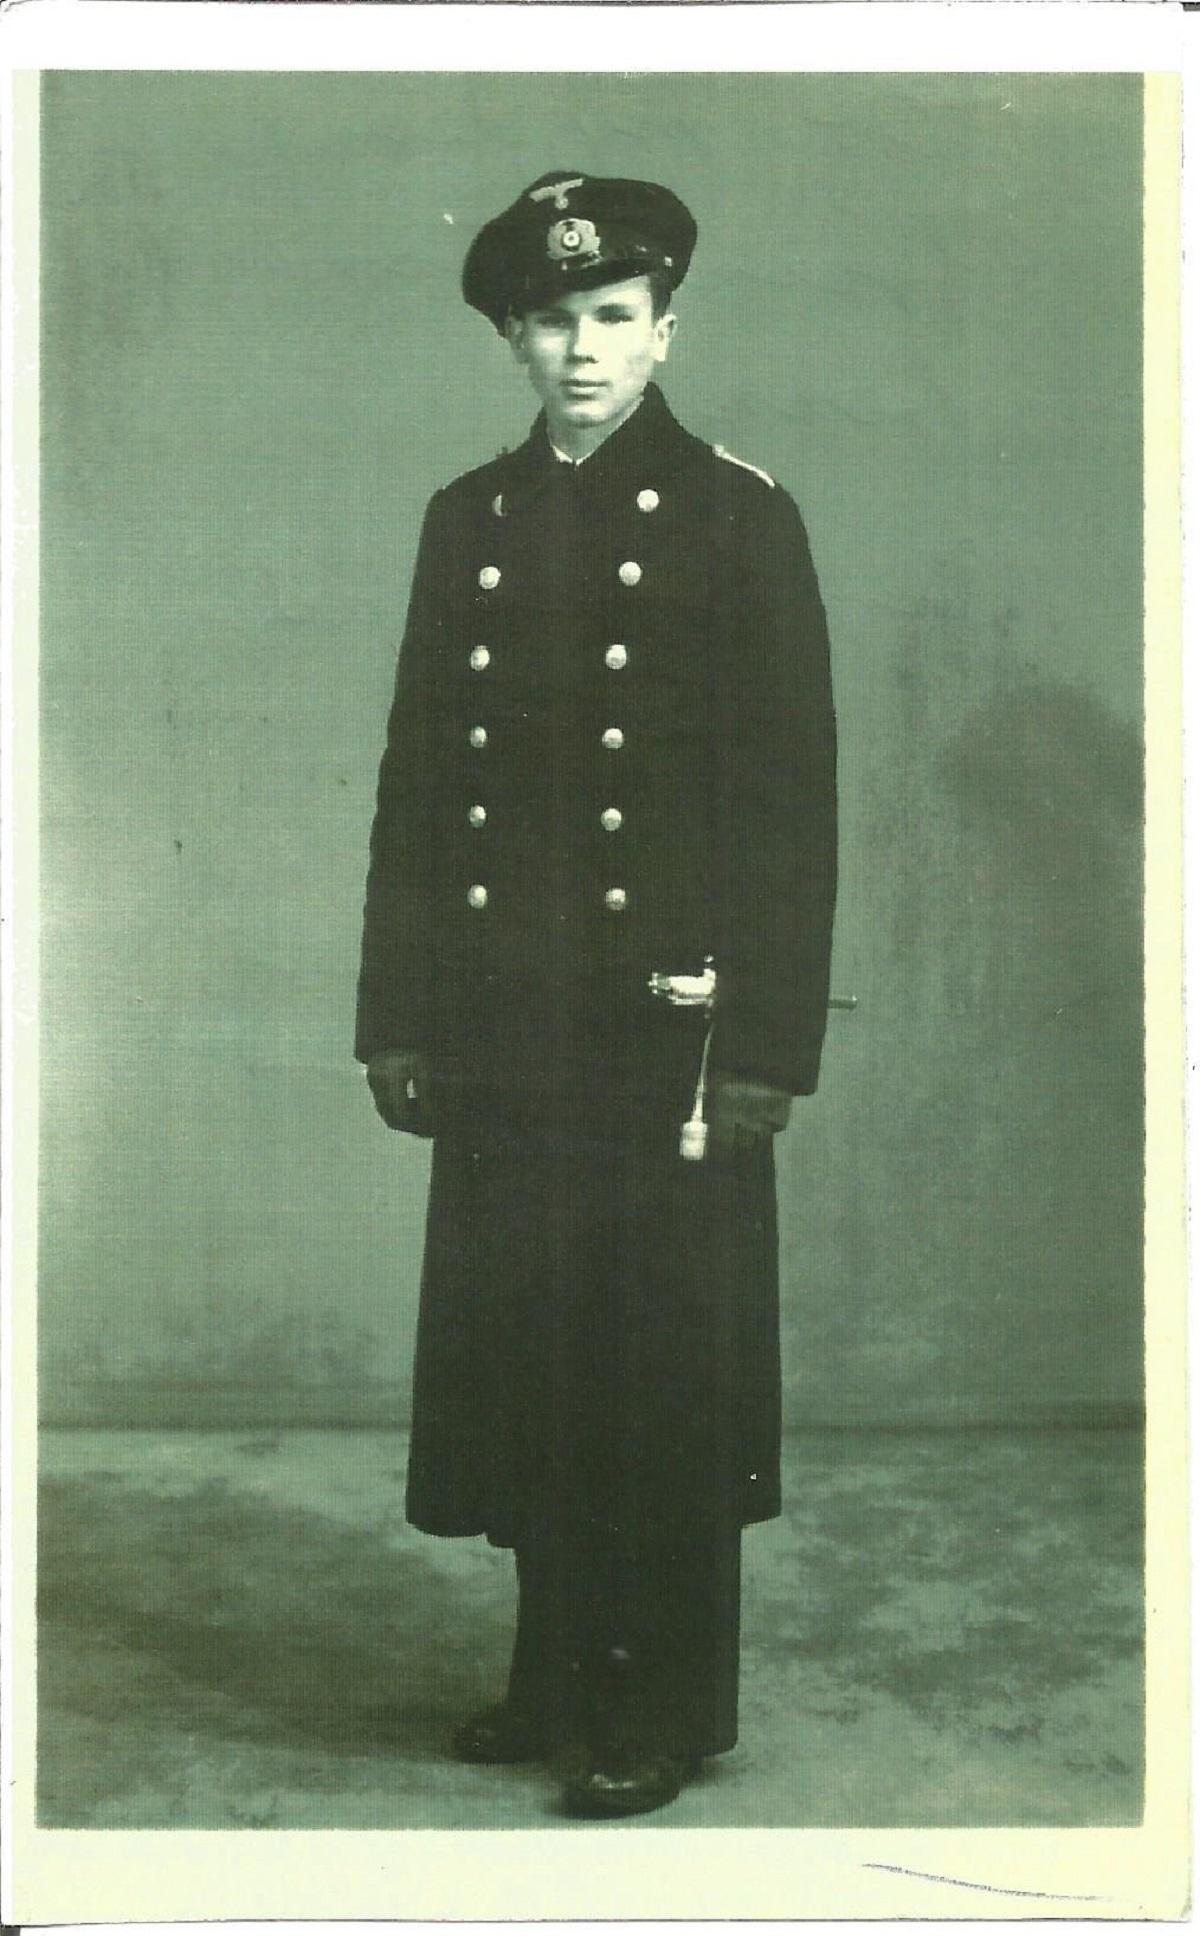 WW2 Tirpitz survivor Alfred Zuba signed on the reverse of 5 x 3 b w portrait photo of him in